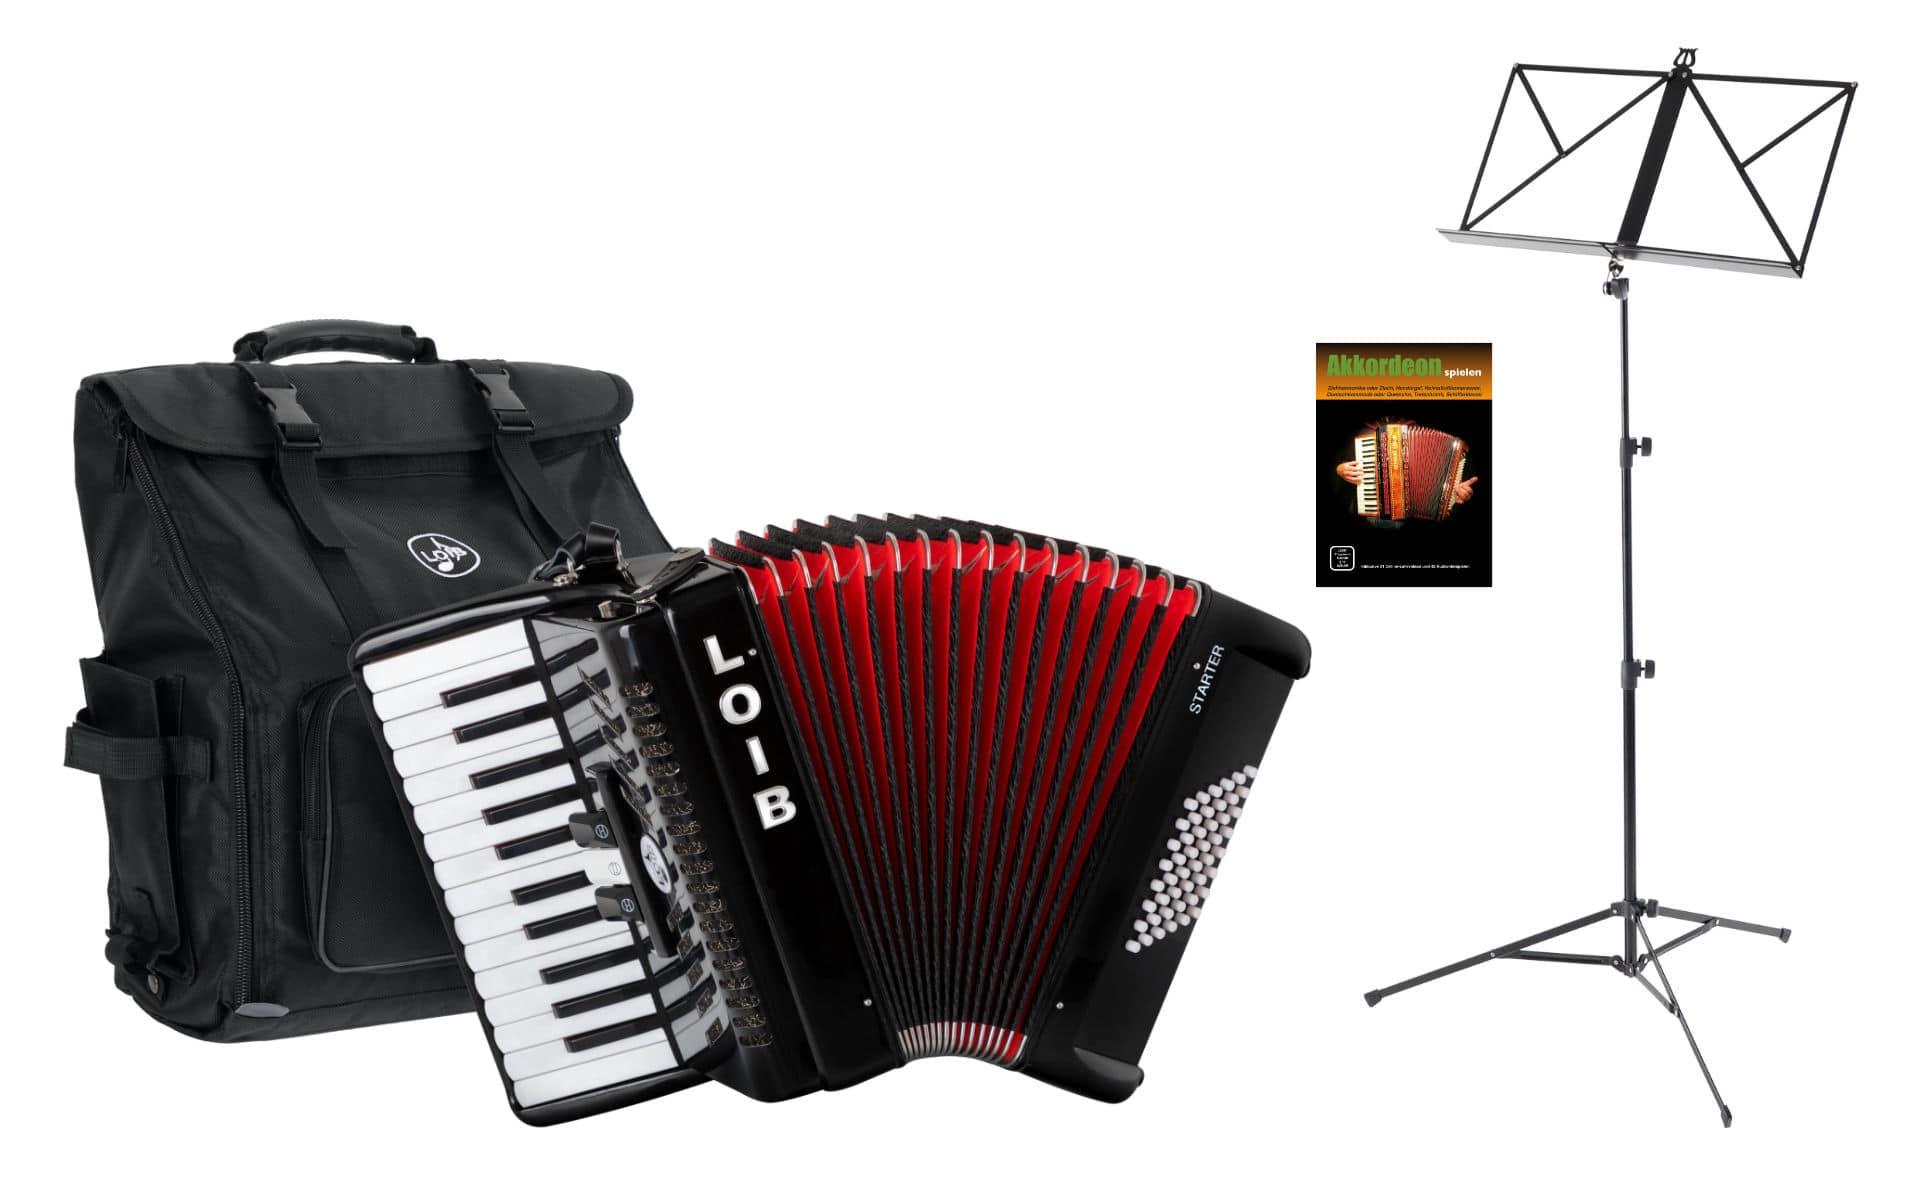 Akkordeons - Loib Starter II 48 BK Einsteiger Akkordeon Set Schwarz - Onlineshop Musikhaus Kirstein